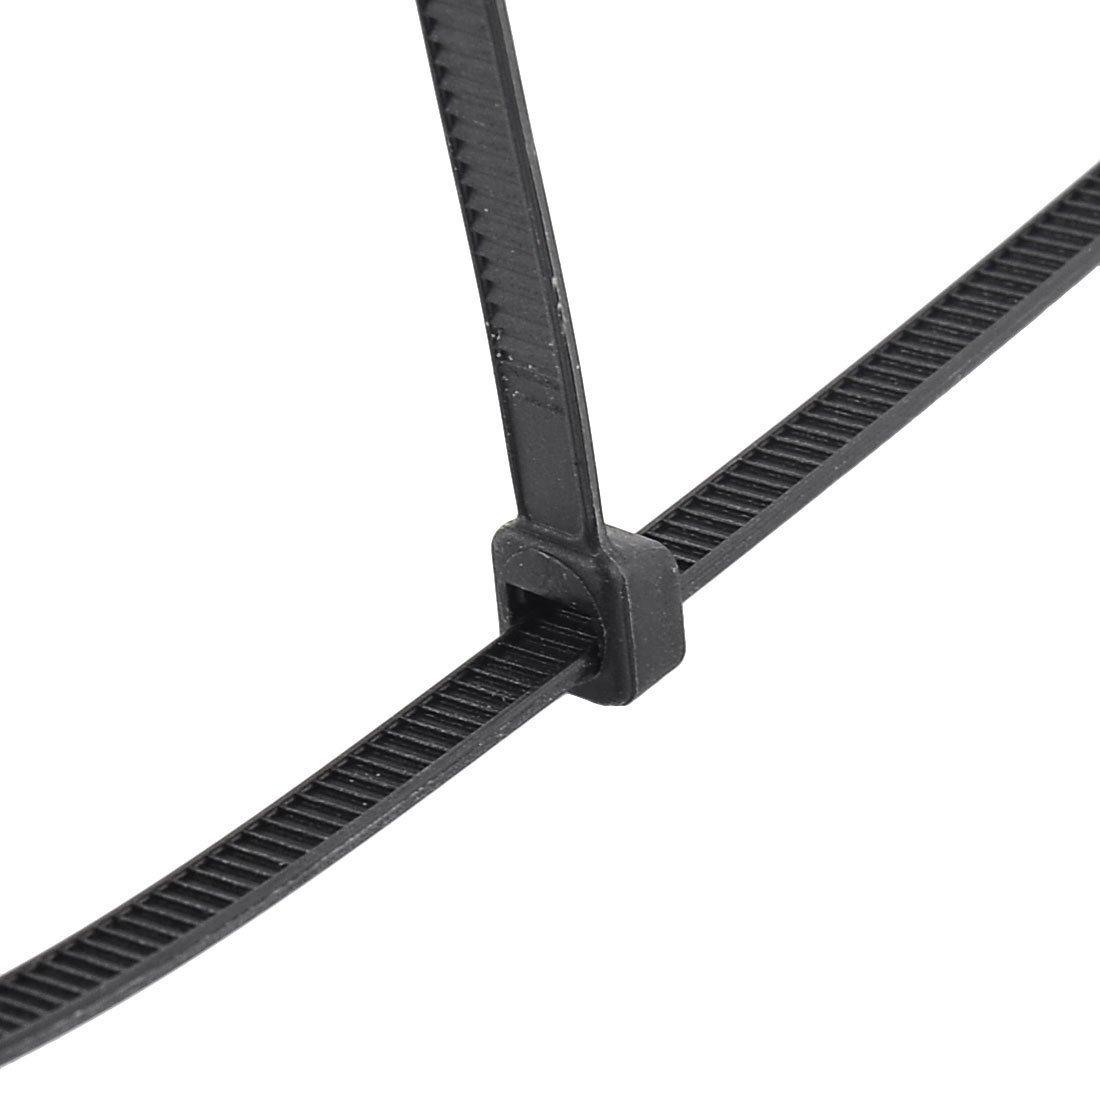 DealMux Nylon Self-locking Cable Tie Zip Loop Power Wire Cord Strap 250pcs